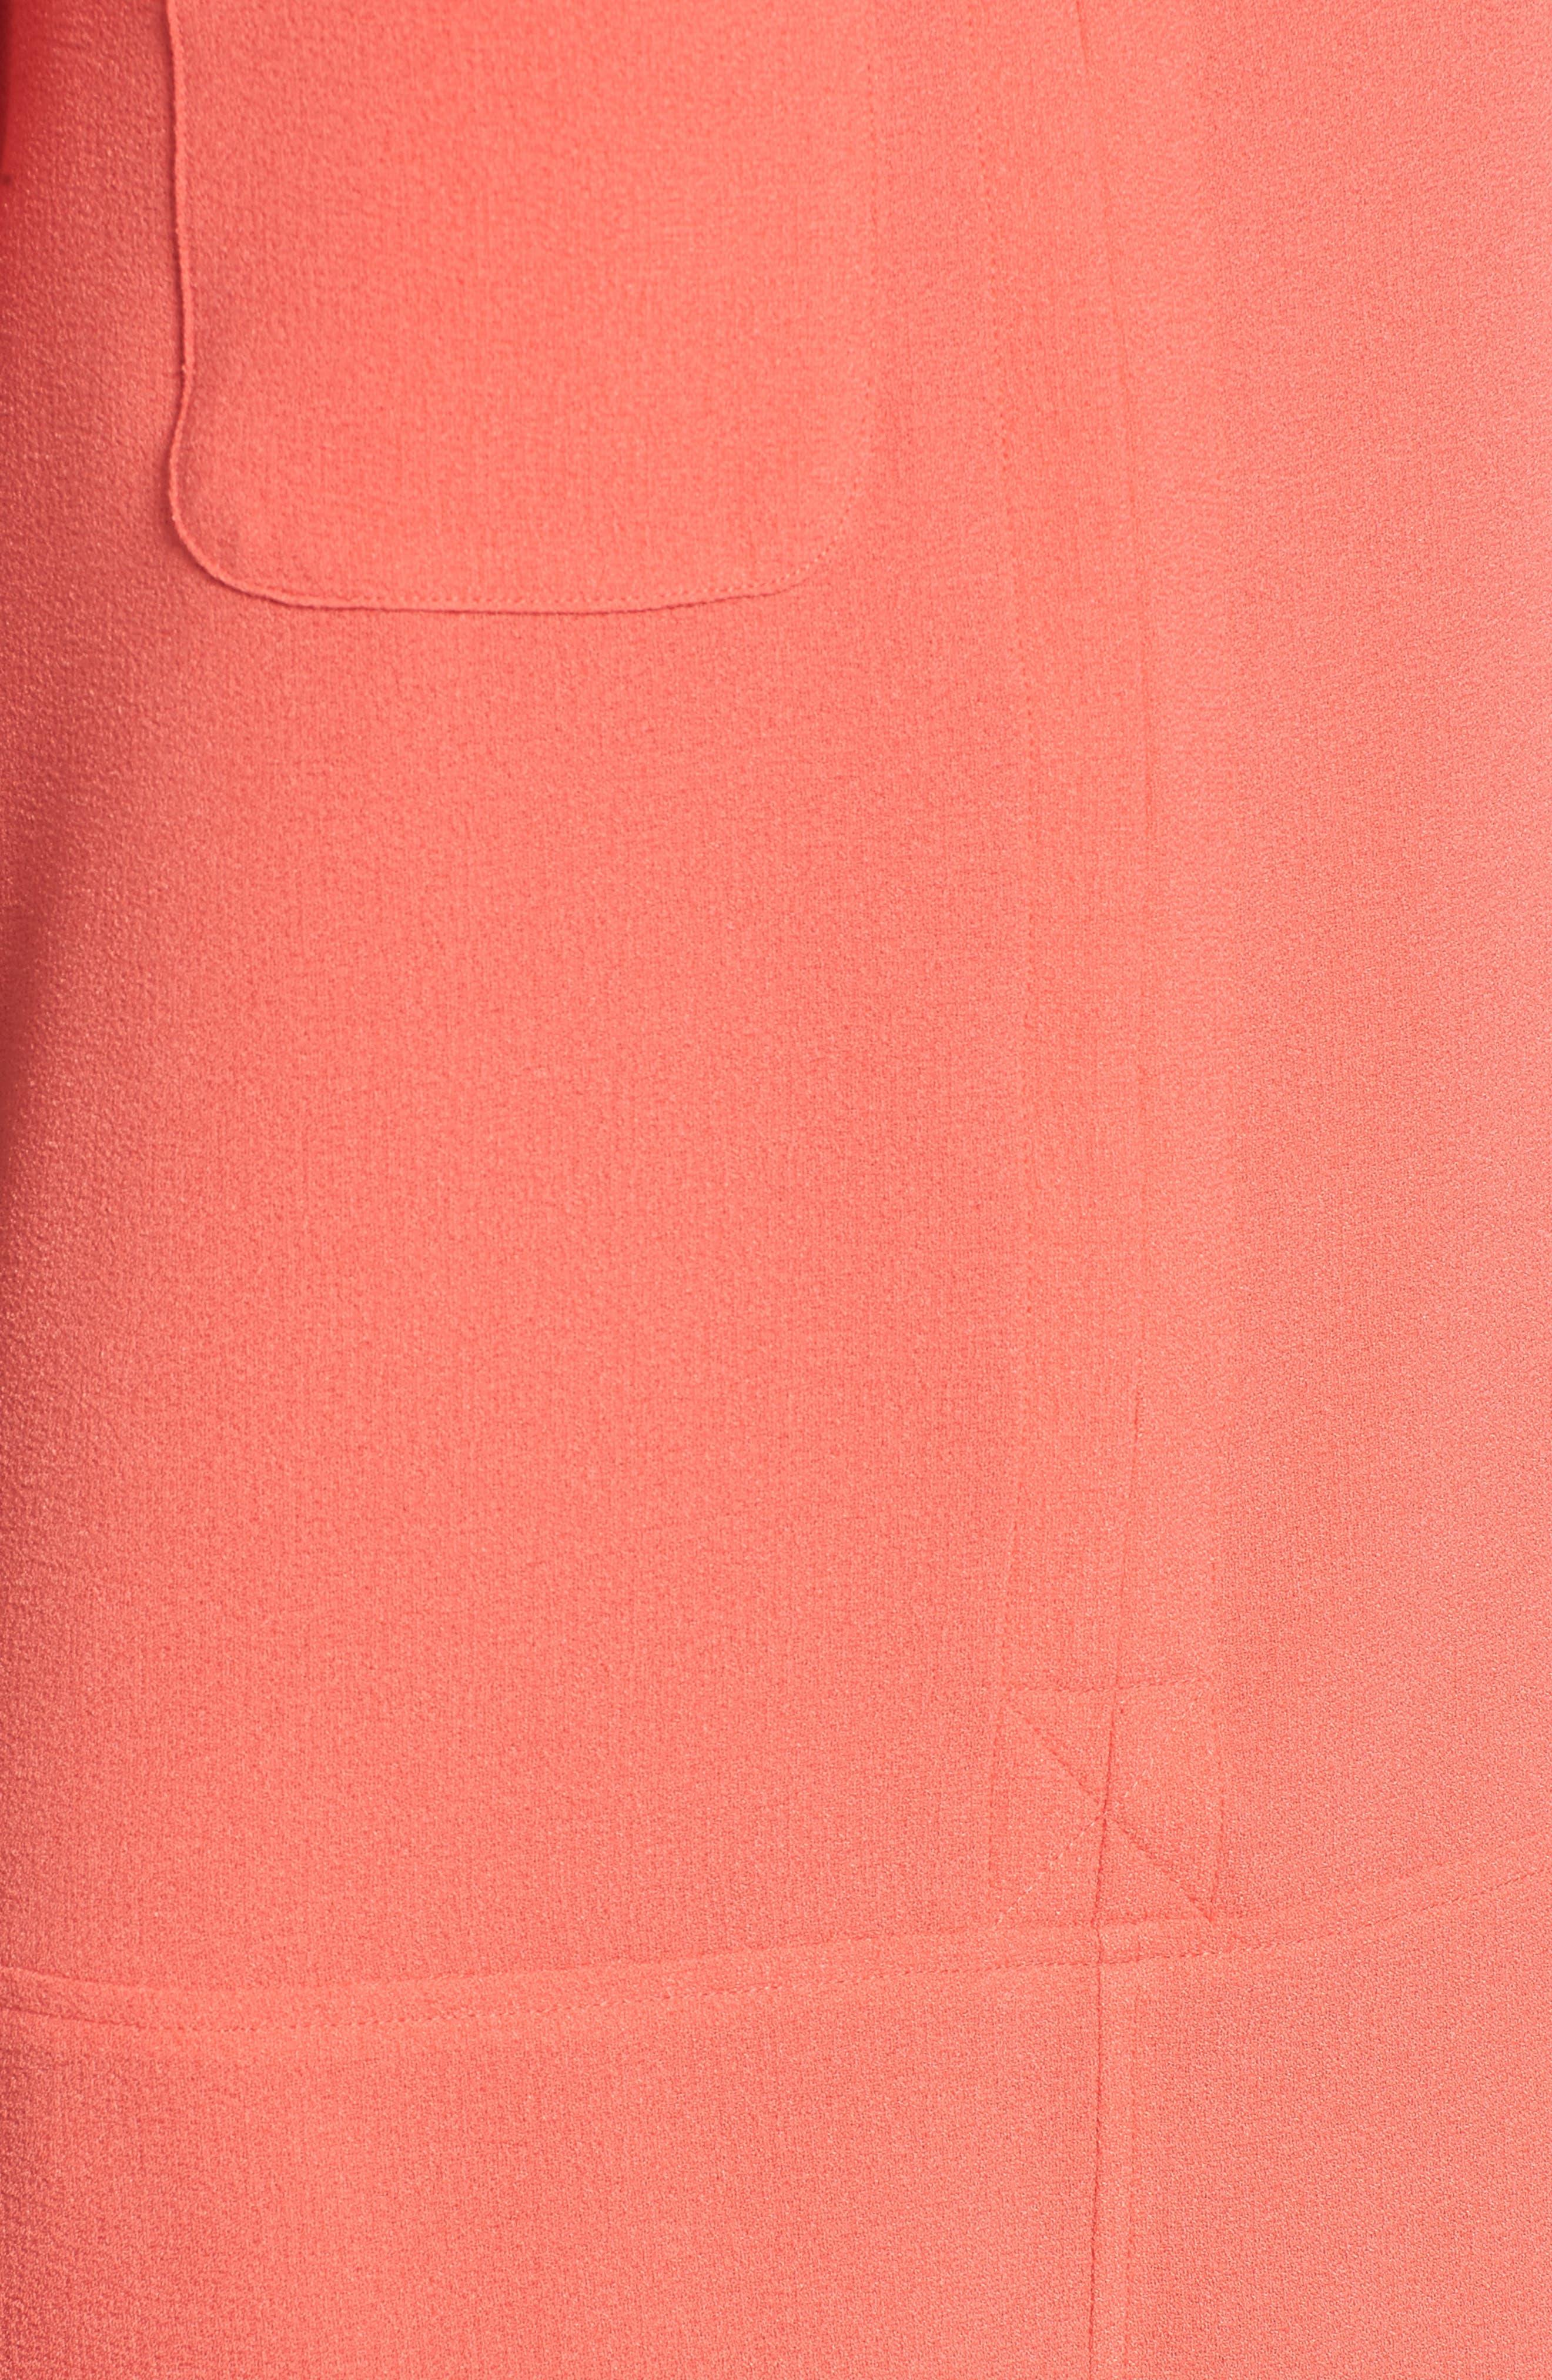 Hailey Crepe Dress,                             Alternate thumbnail 140, color,